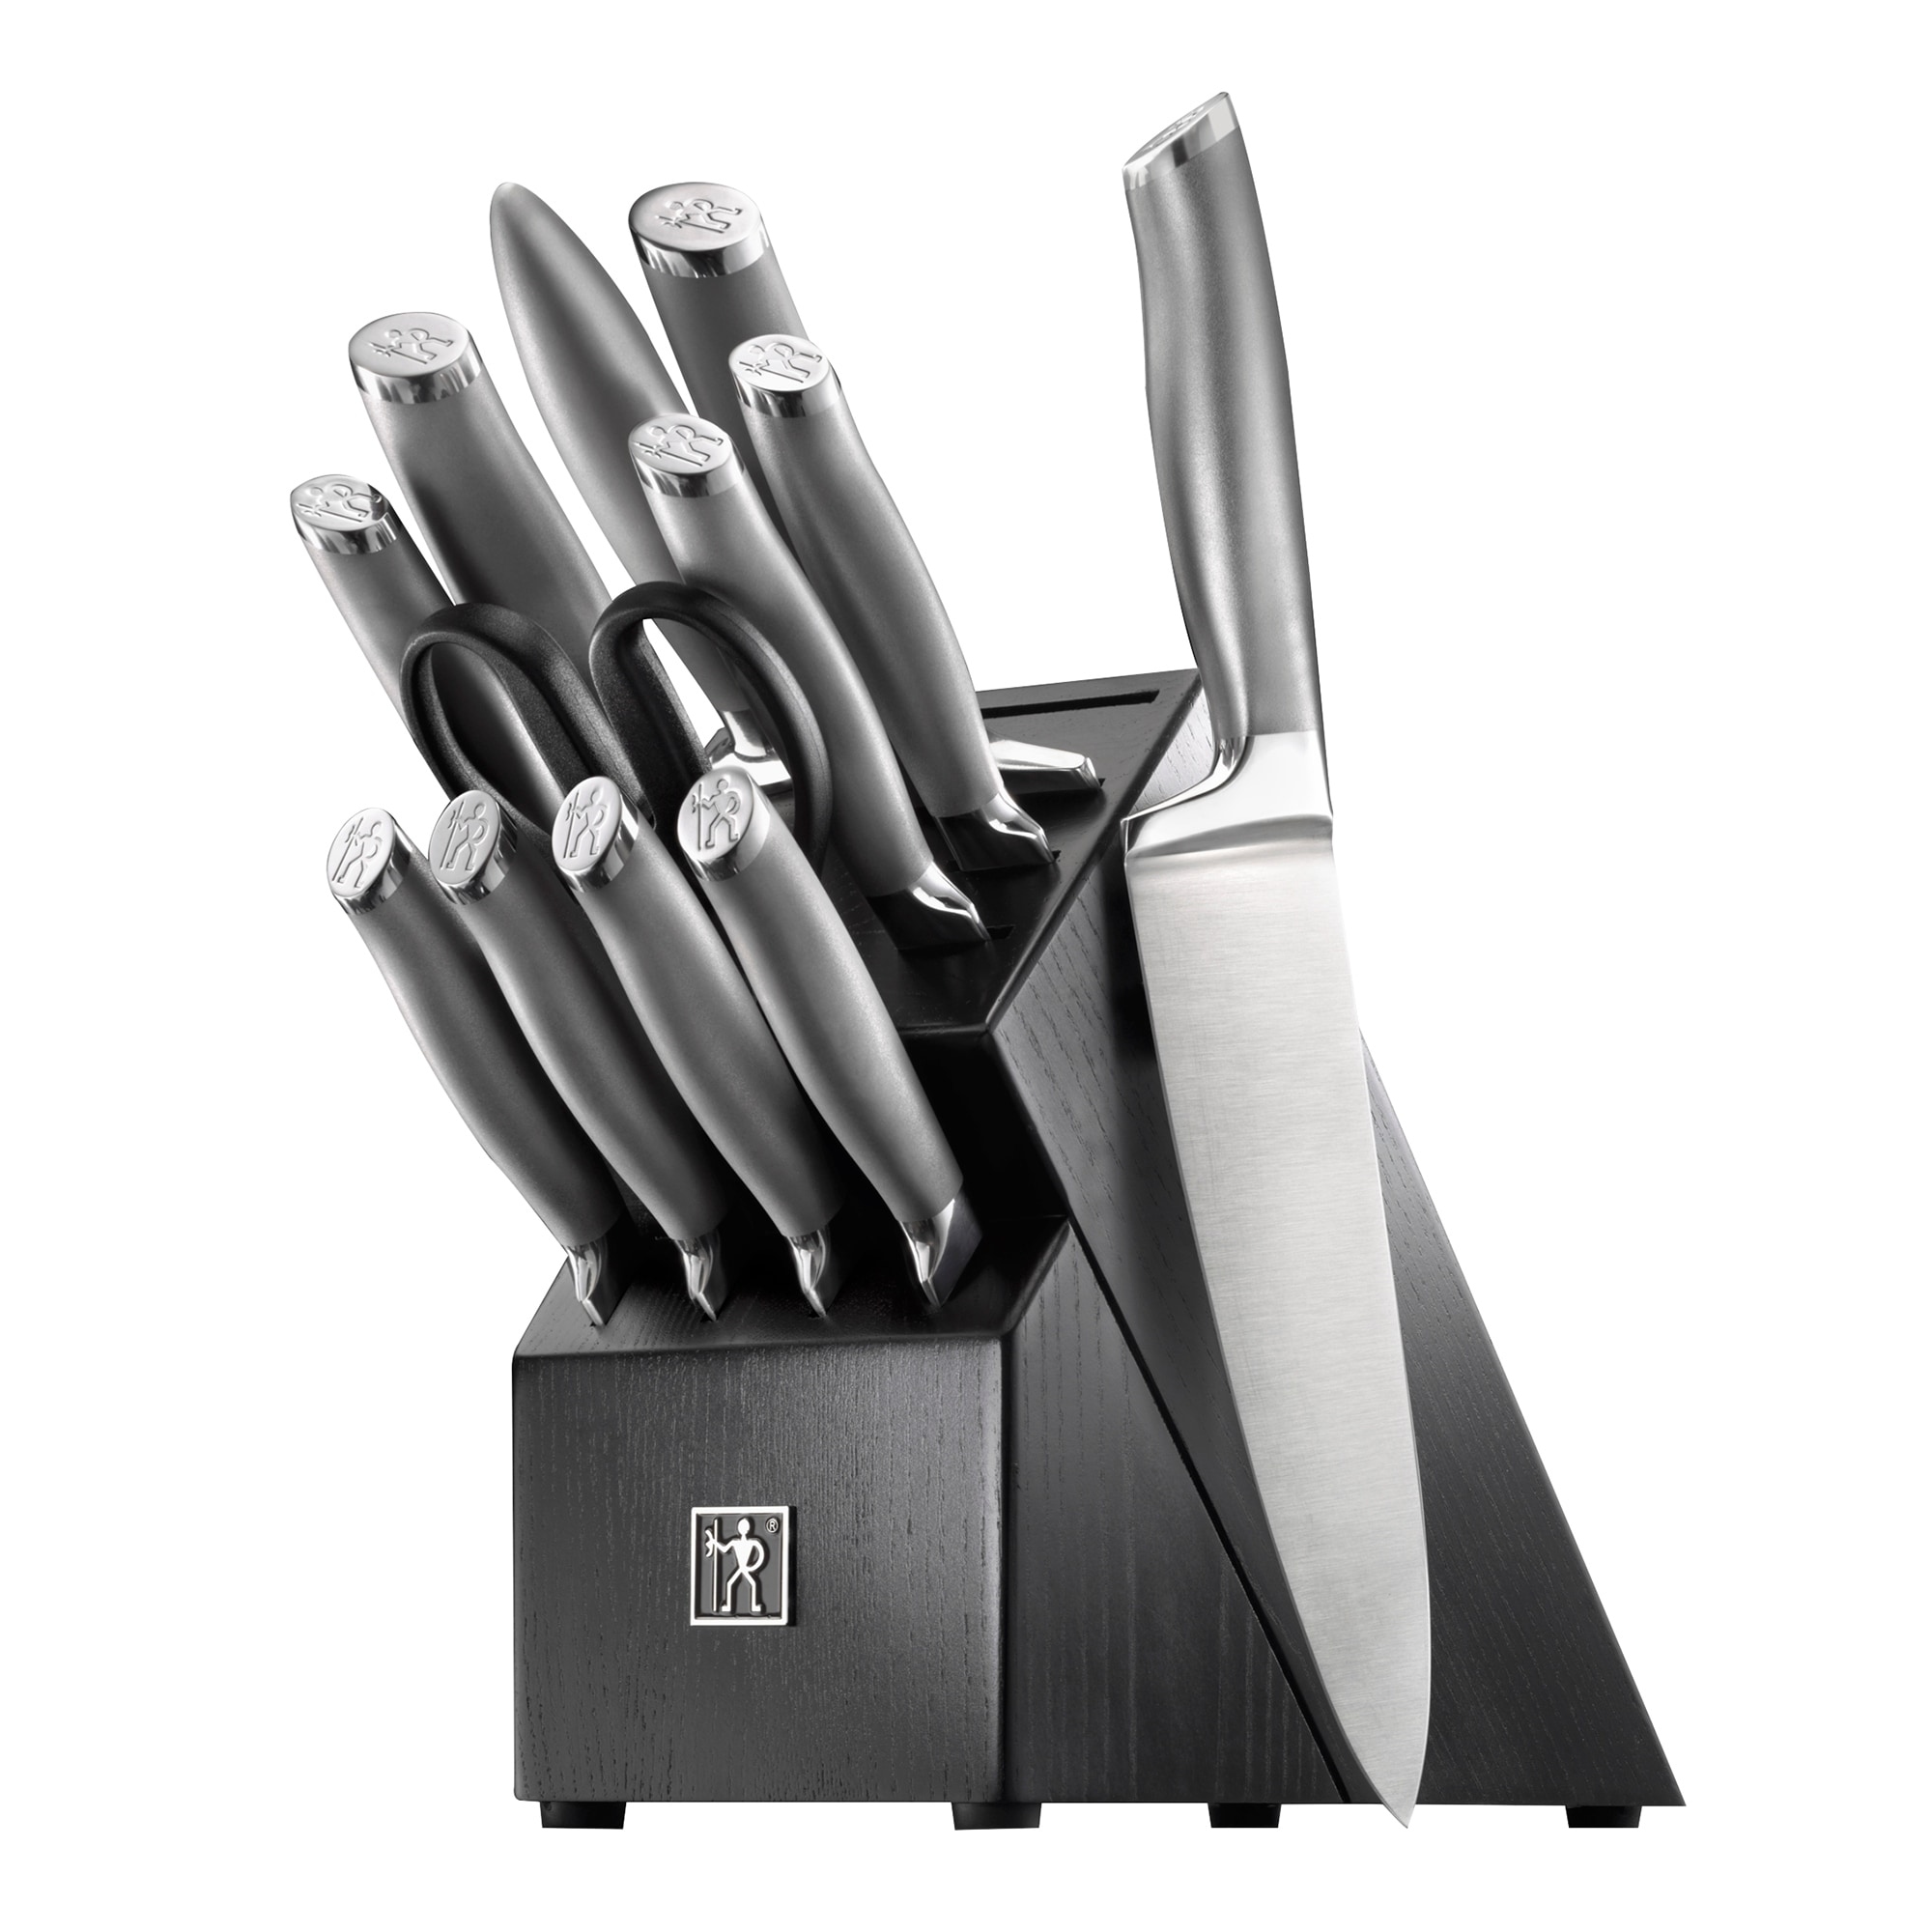 Henckels Modernist 13-pc Knife Block Set - Stainless Steel